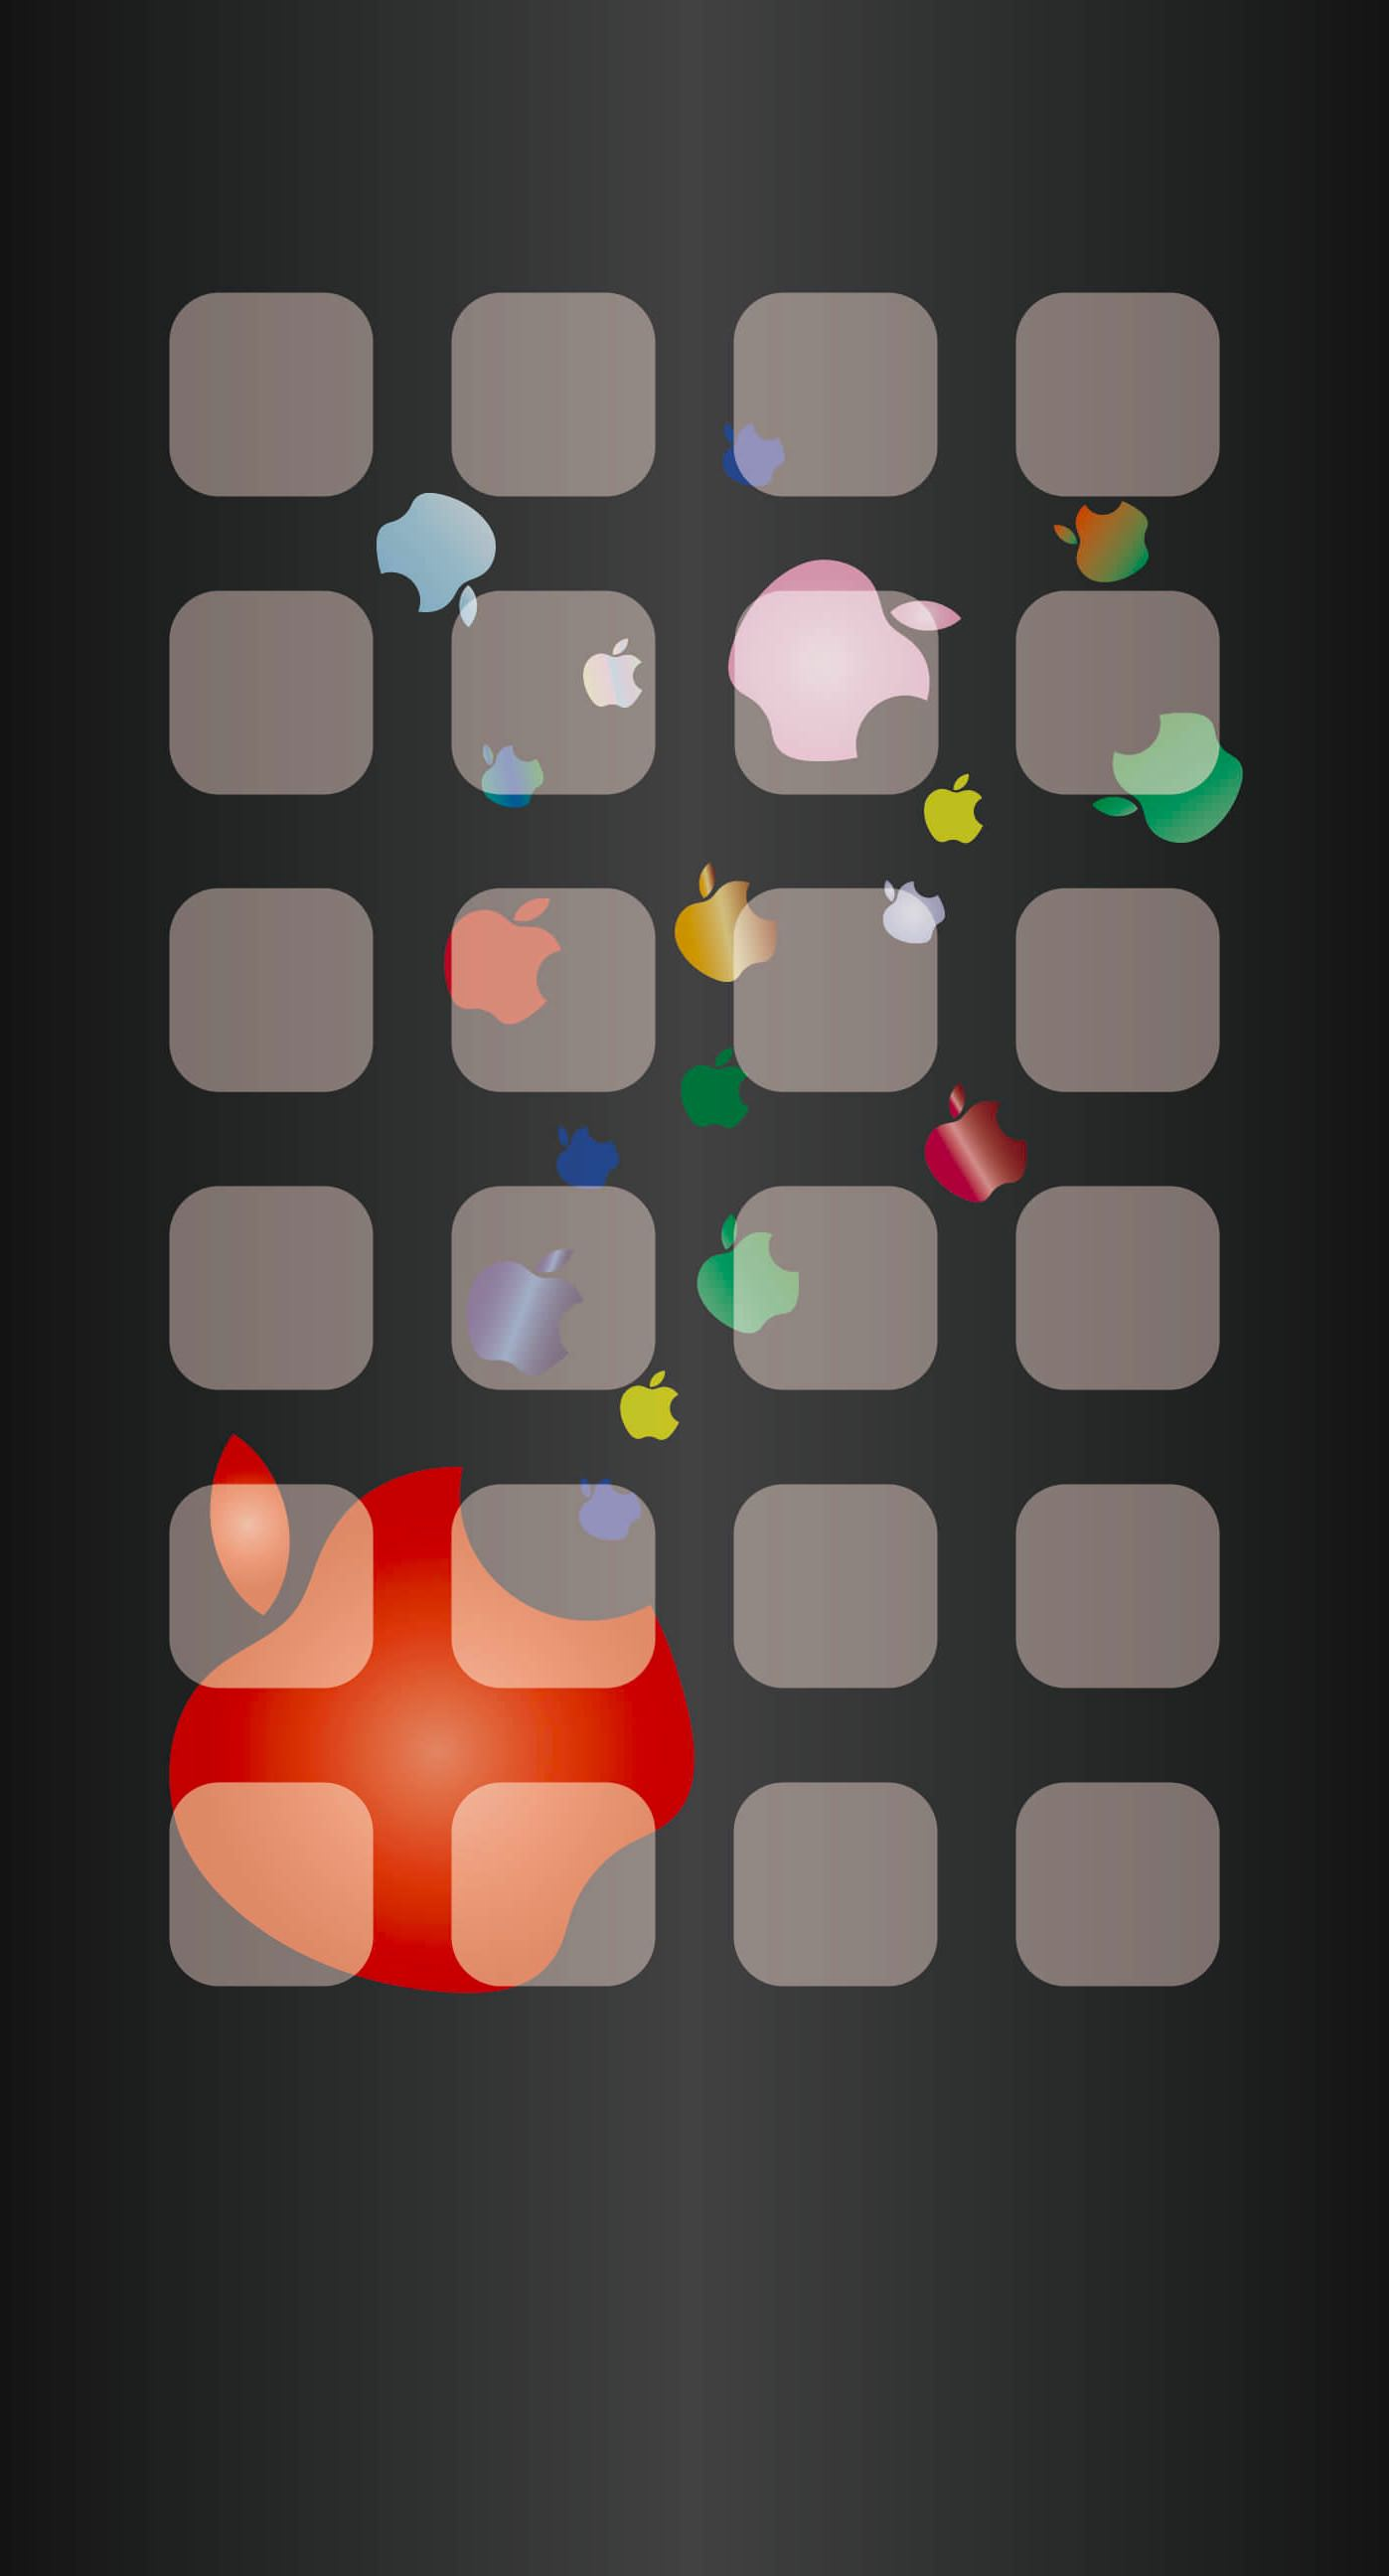 Shelf Apple logo black wallpapersc iPhone7Plus 1398x2592